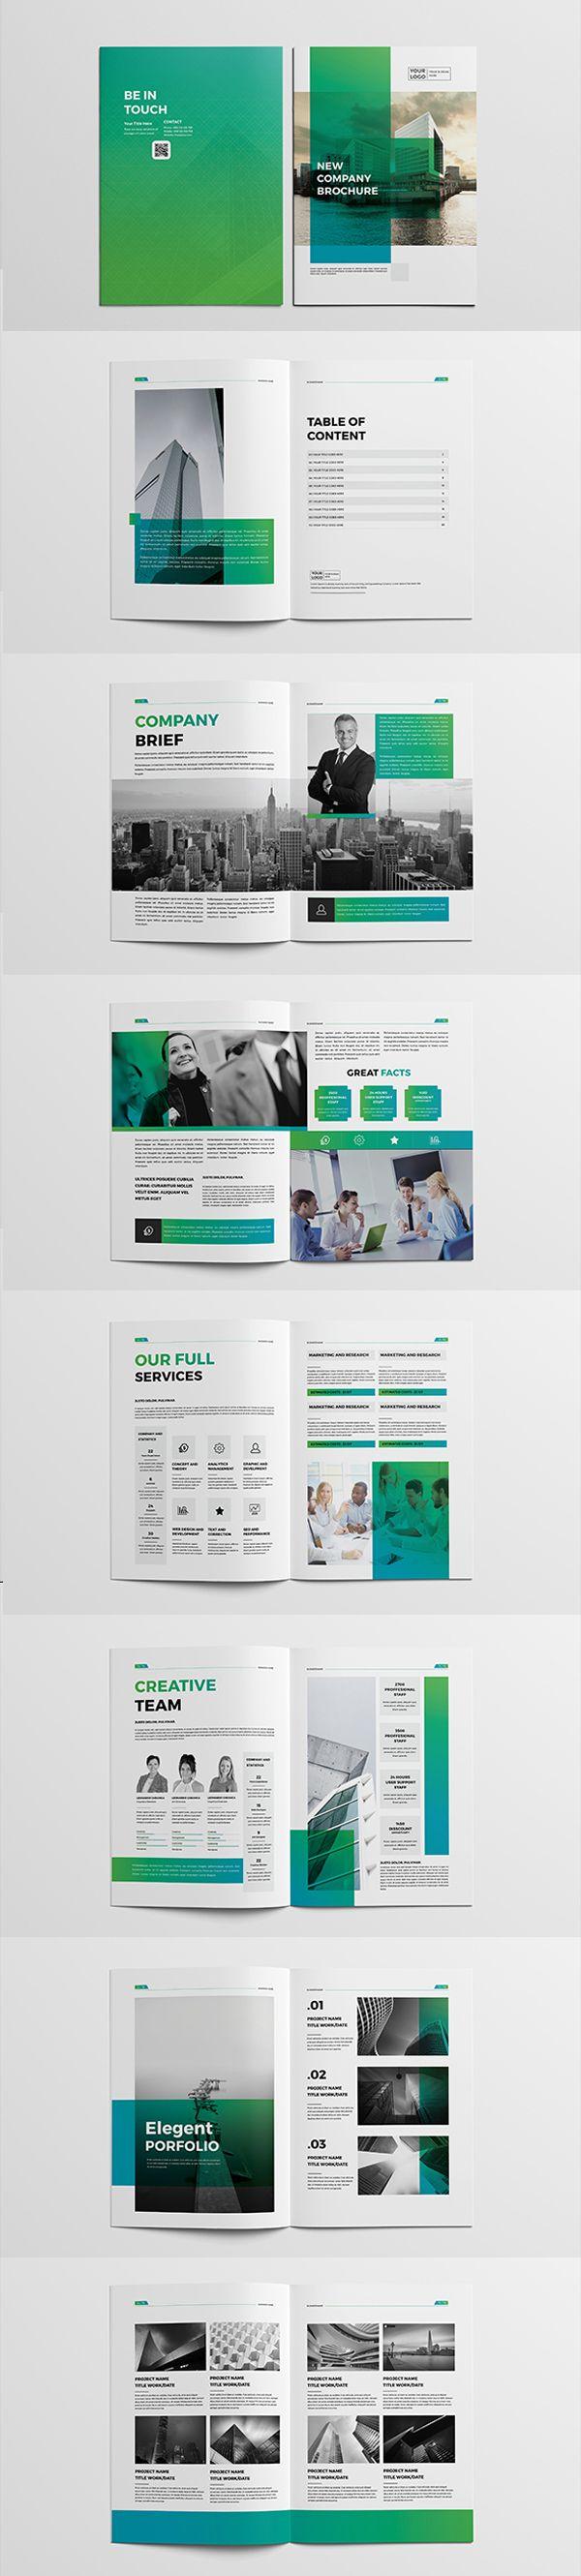 Professional Business Company Brochure #annualreport #booklet #brochuredesign #brochuretemplates #fashioncatalog #portfolio